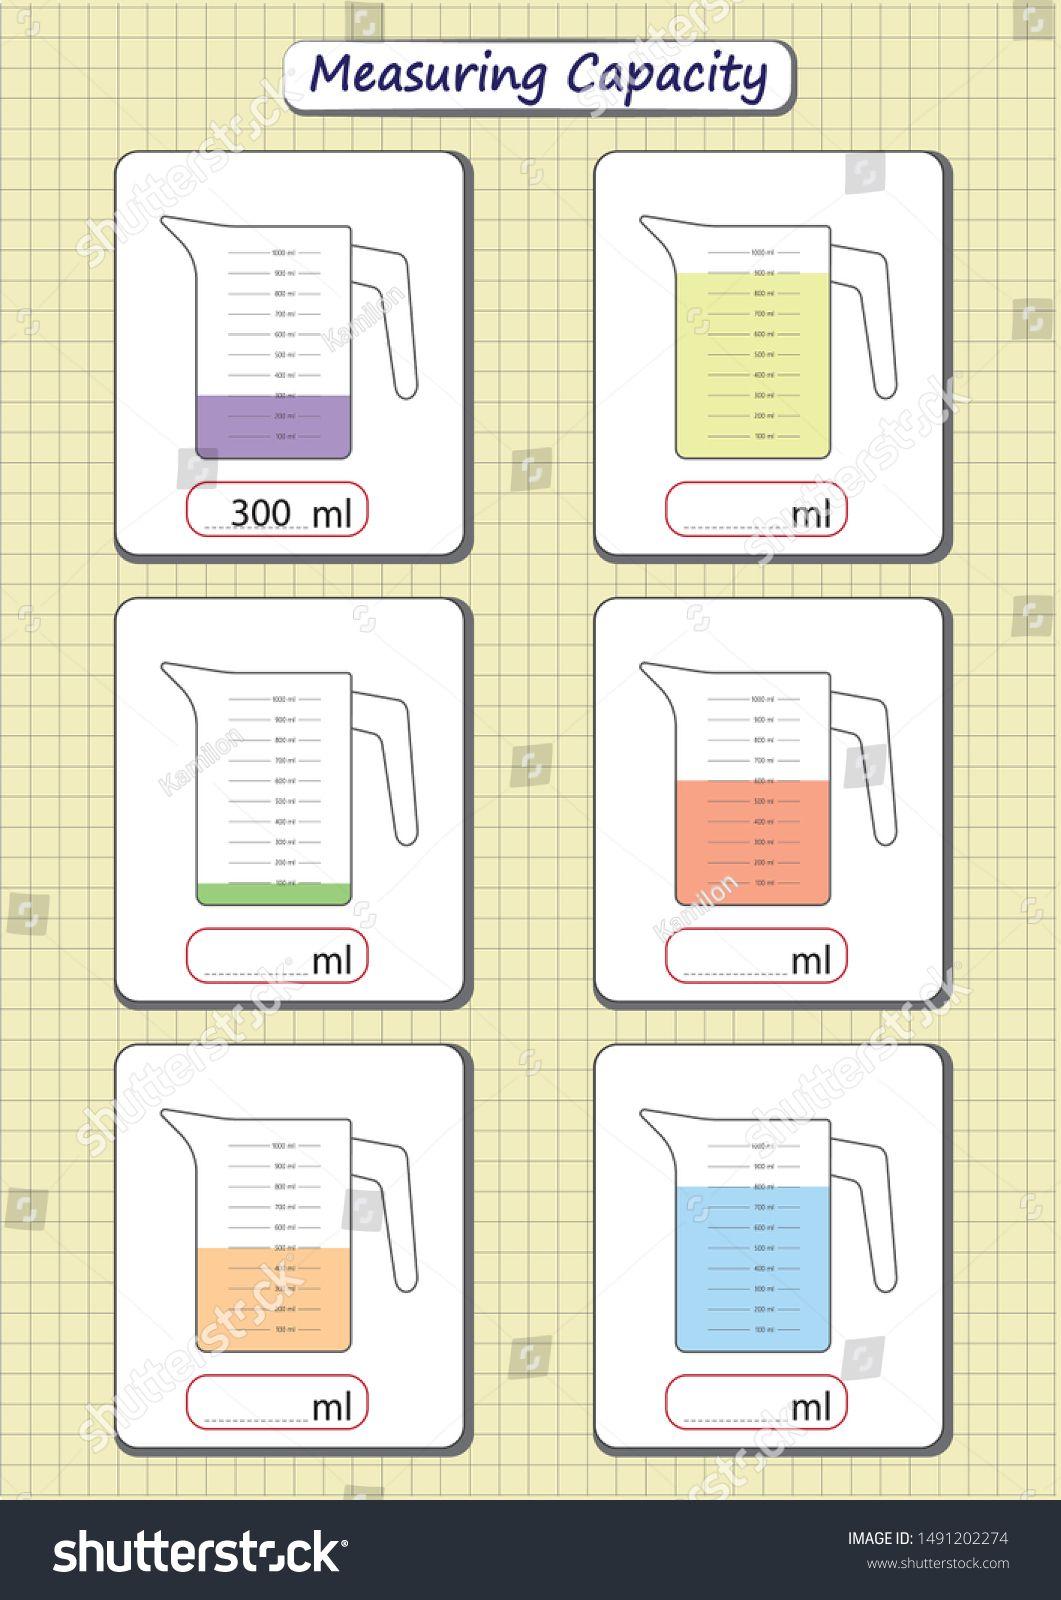 Measuring Capacity Of The Cups Measuring Jugs Worksheet